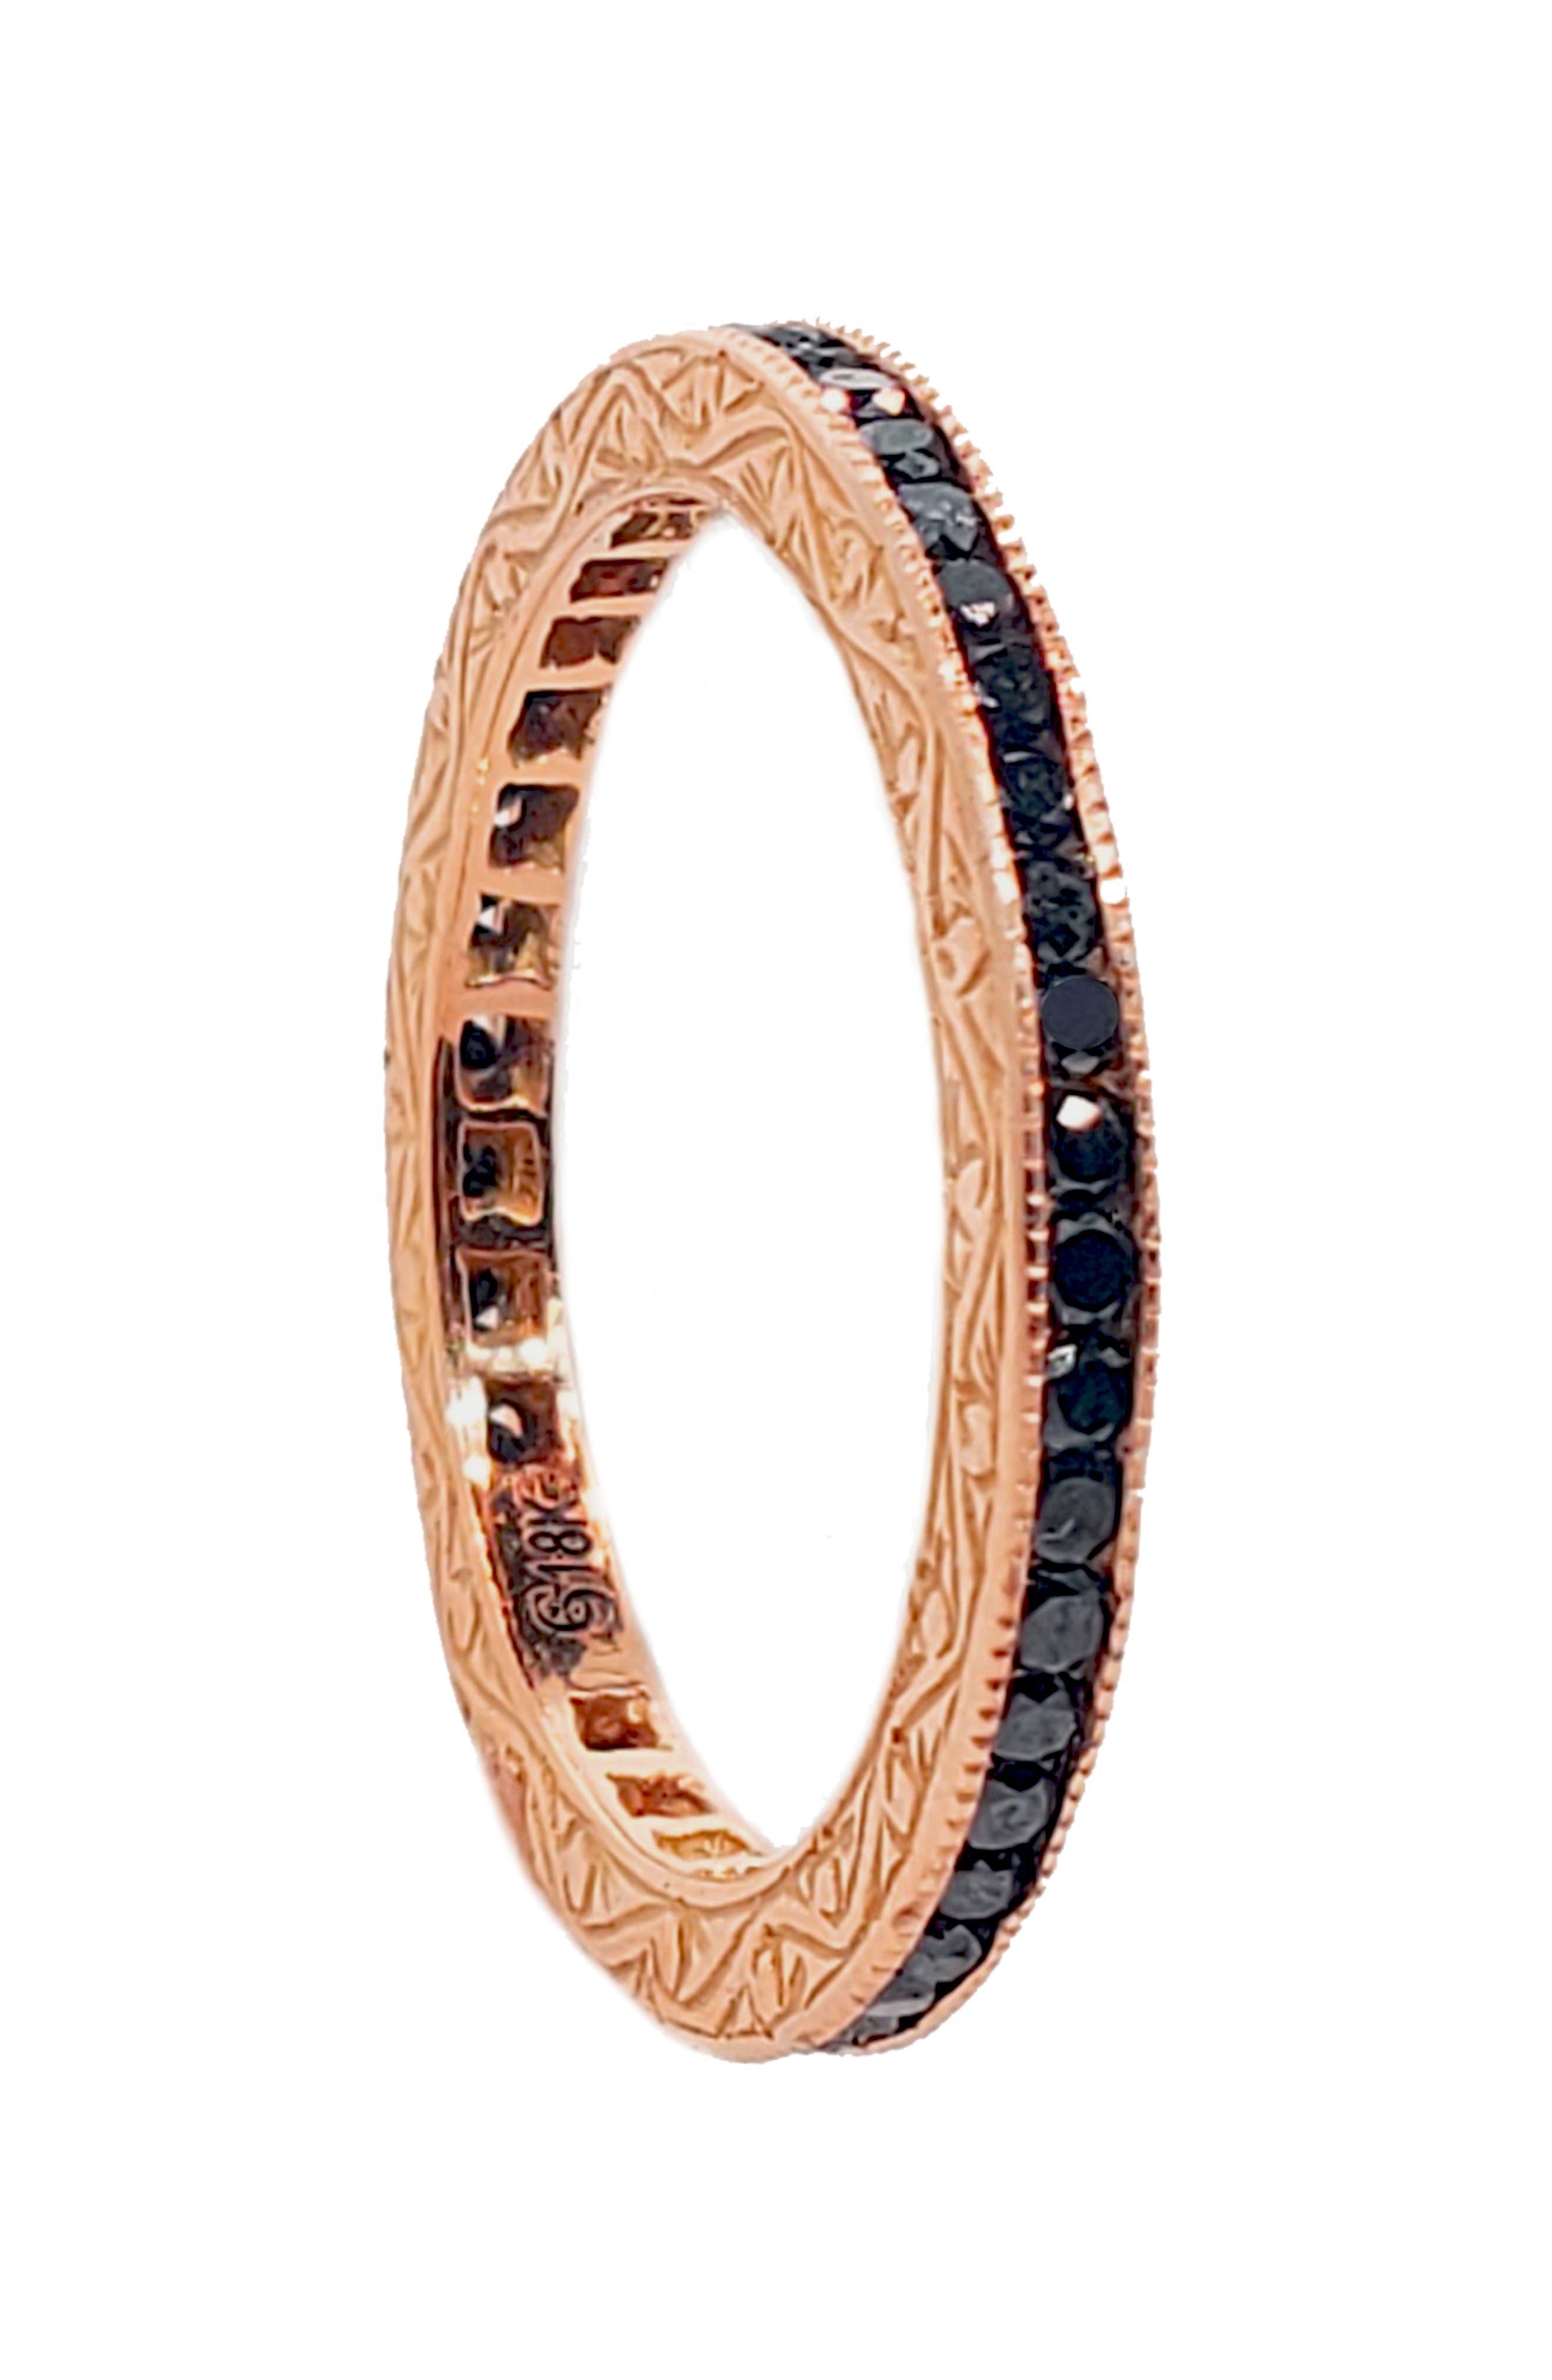 Channel Set Diamond Ring,                         Main,                         color, ROSE GOLD/ BLACK DIAMOND